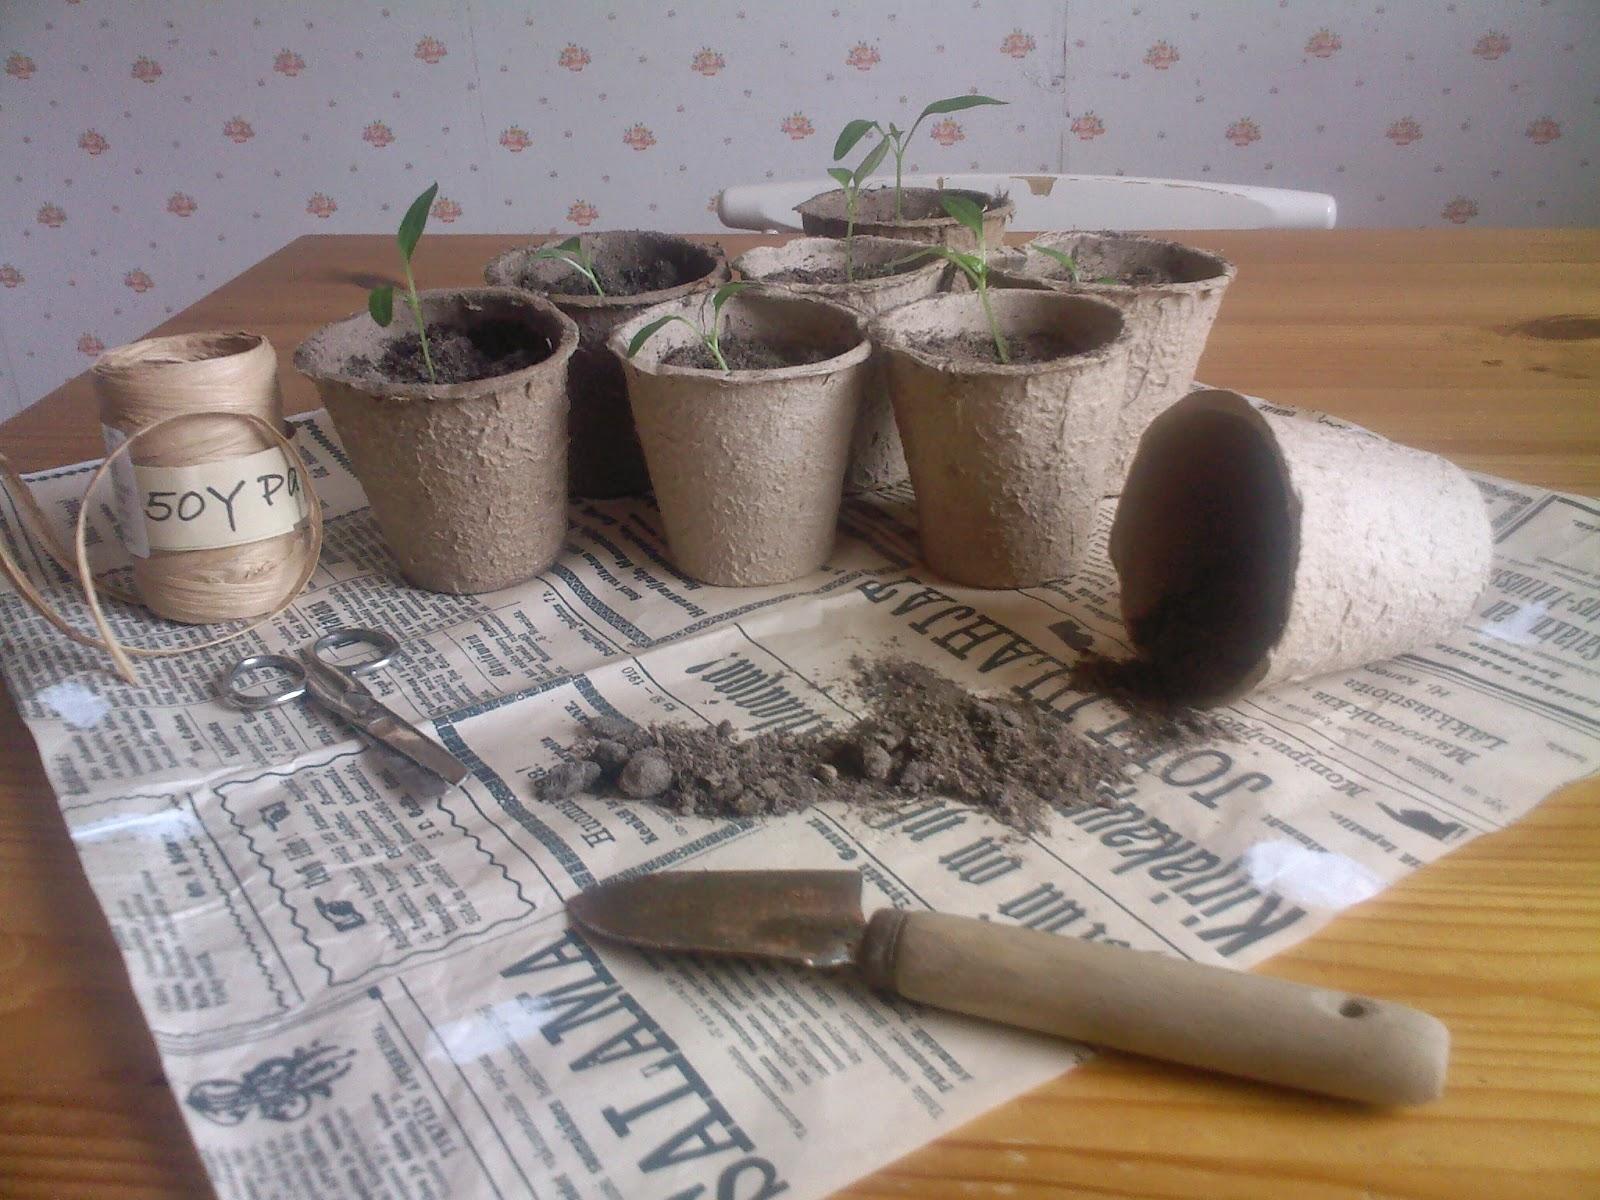 chilin kasvatus, taimet